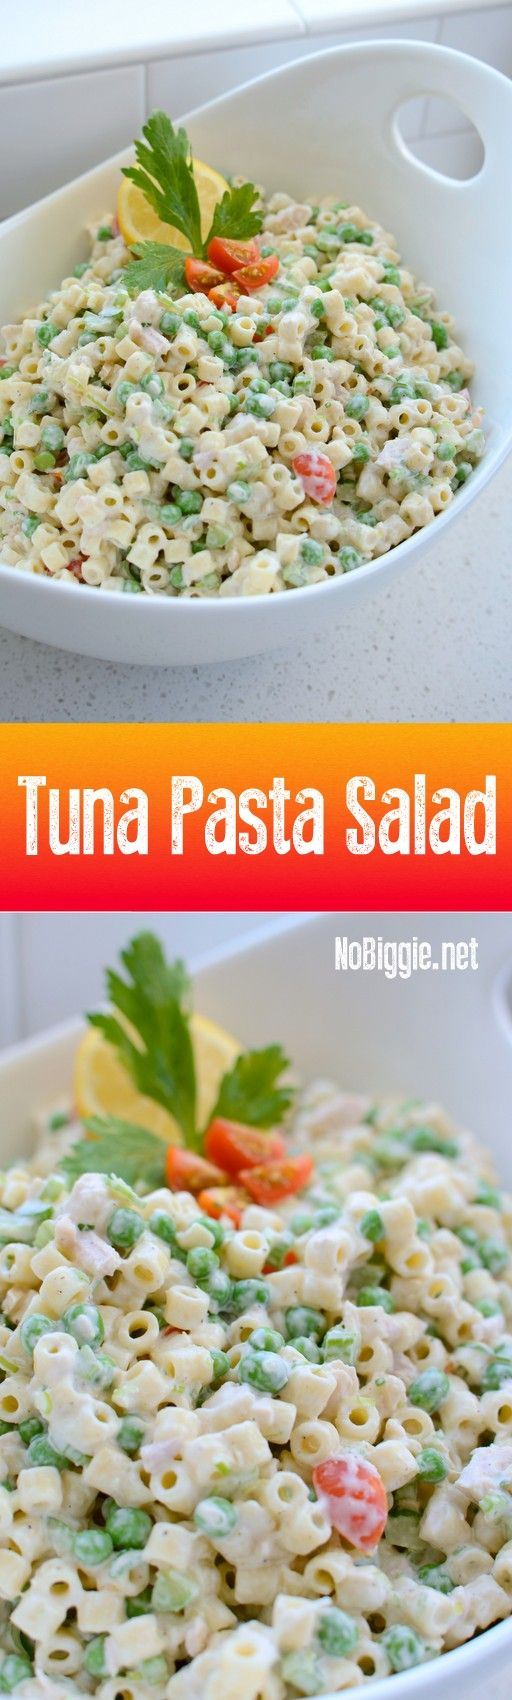 Tuna Pasta Salad | NoBiggie.net